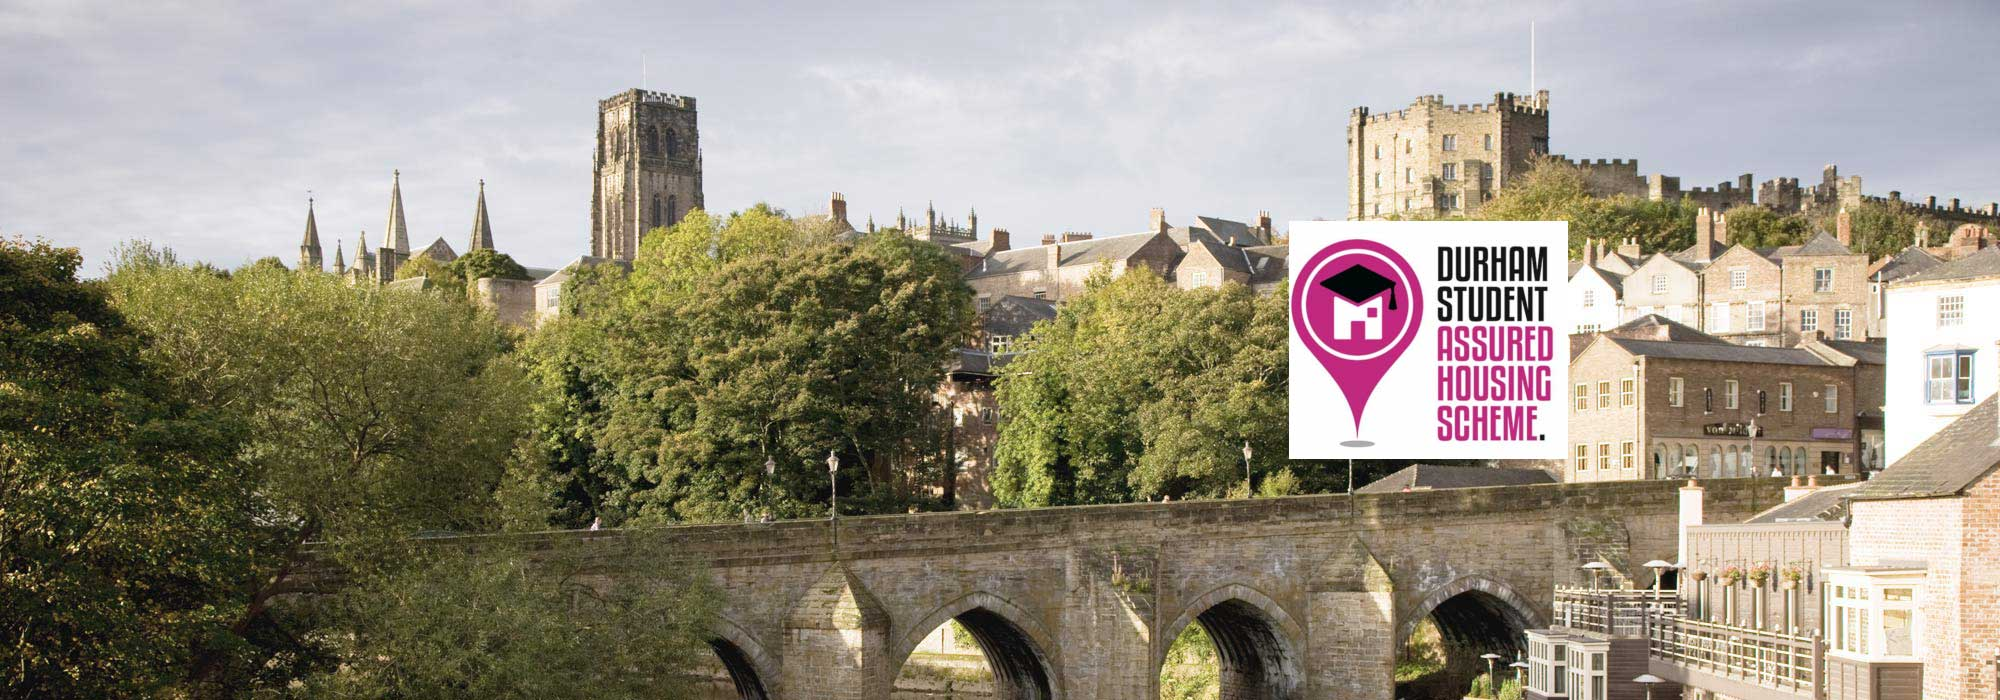 Urbis Properties – Durham